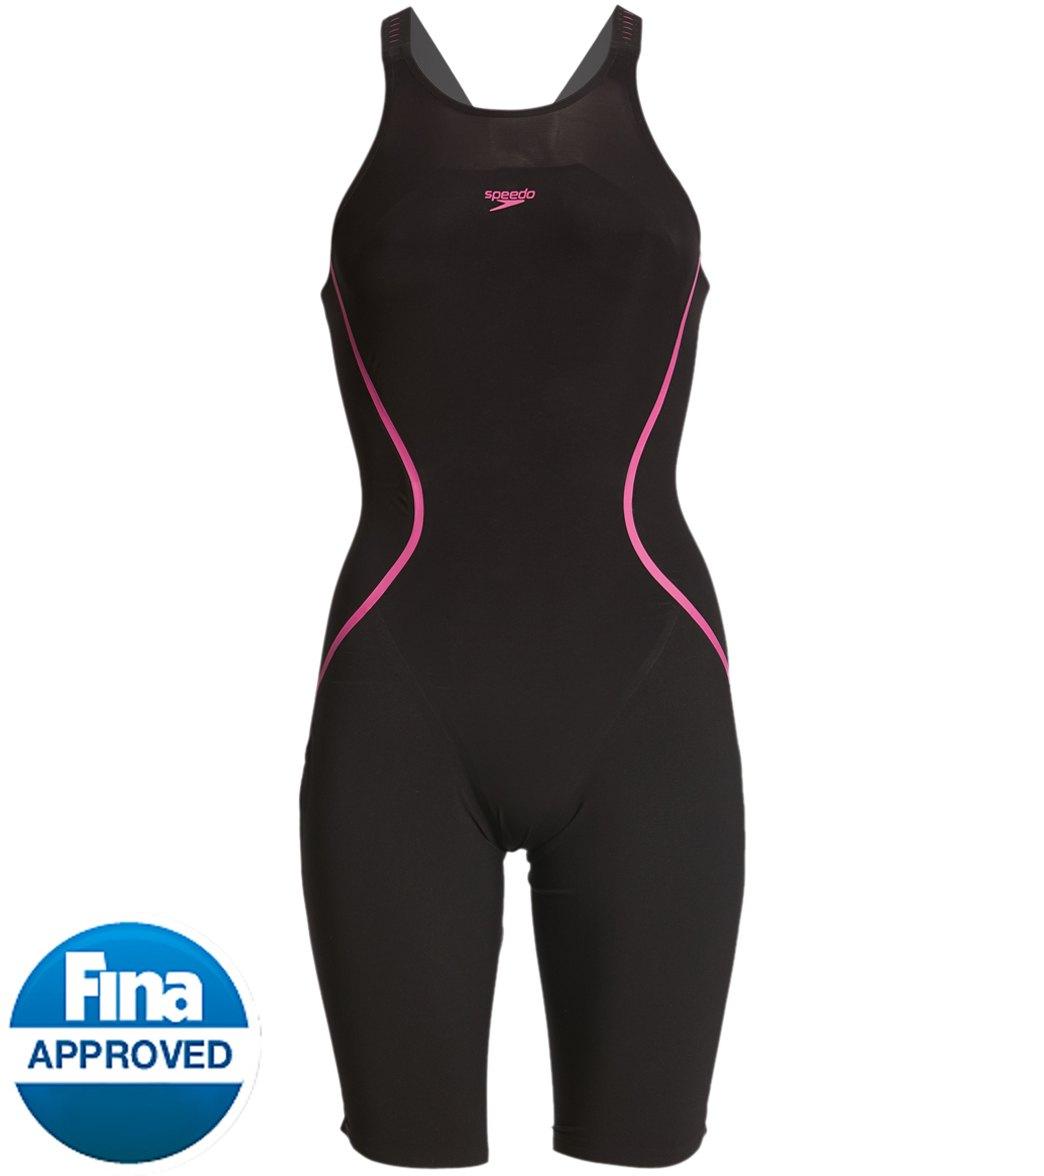 bf5b404c9a90f Speedo Women s LZR Racer X Open Back Kneeskin Tech Suit Swimsuit at  SwimOutlet.com - Free Shipping